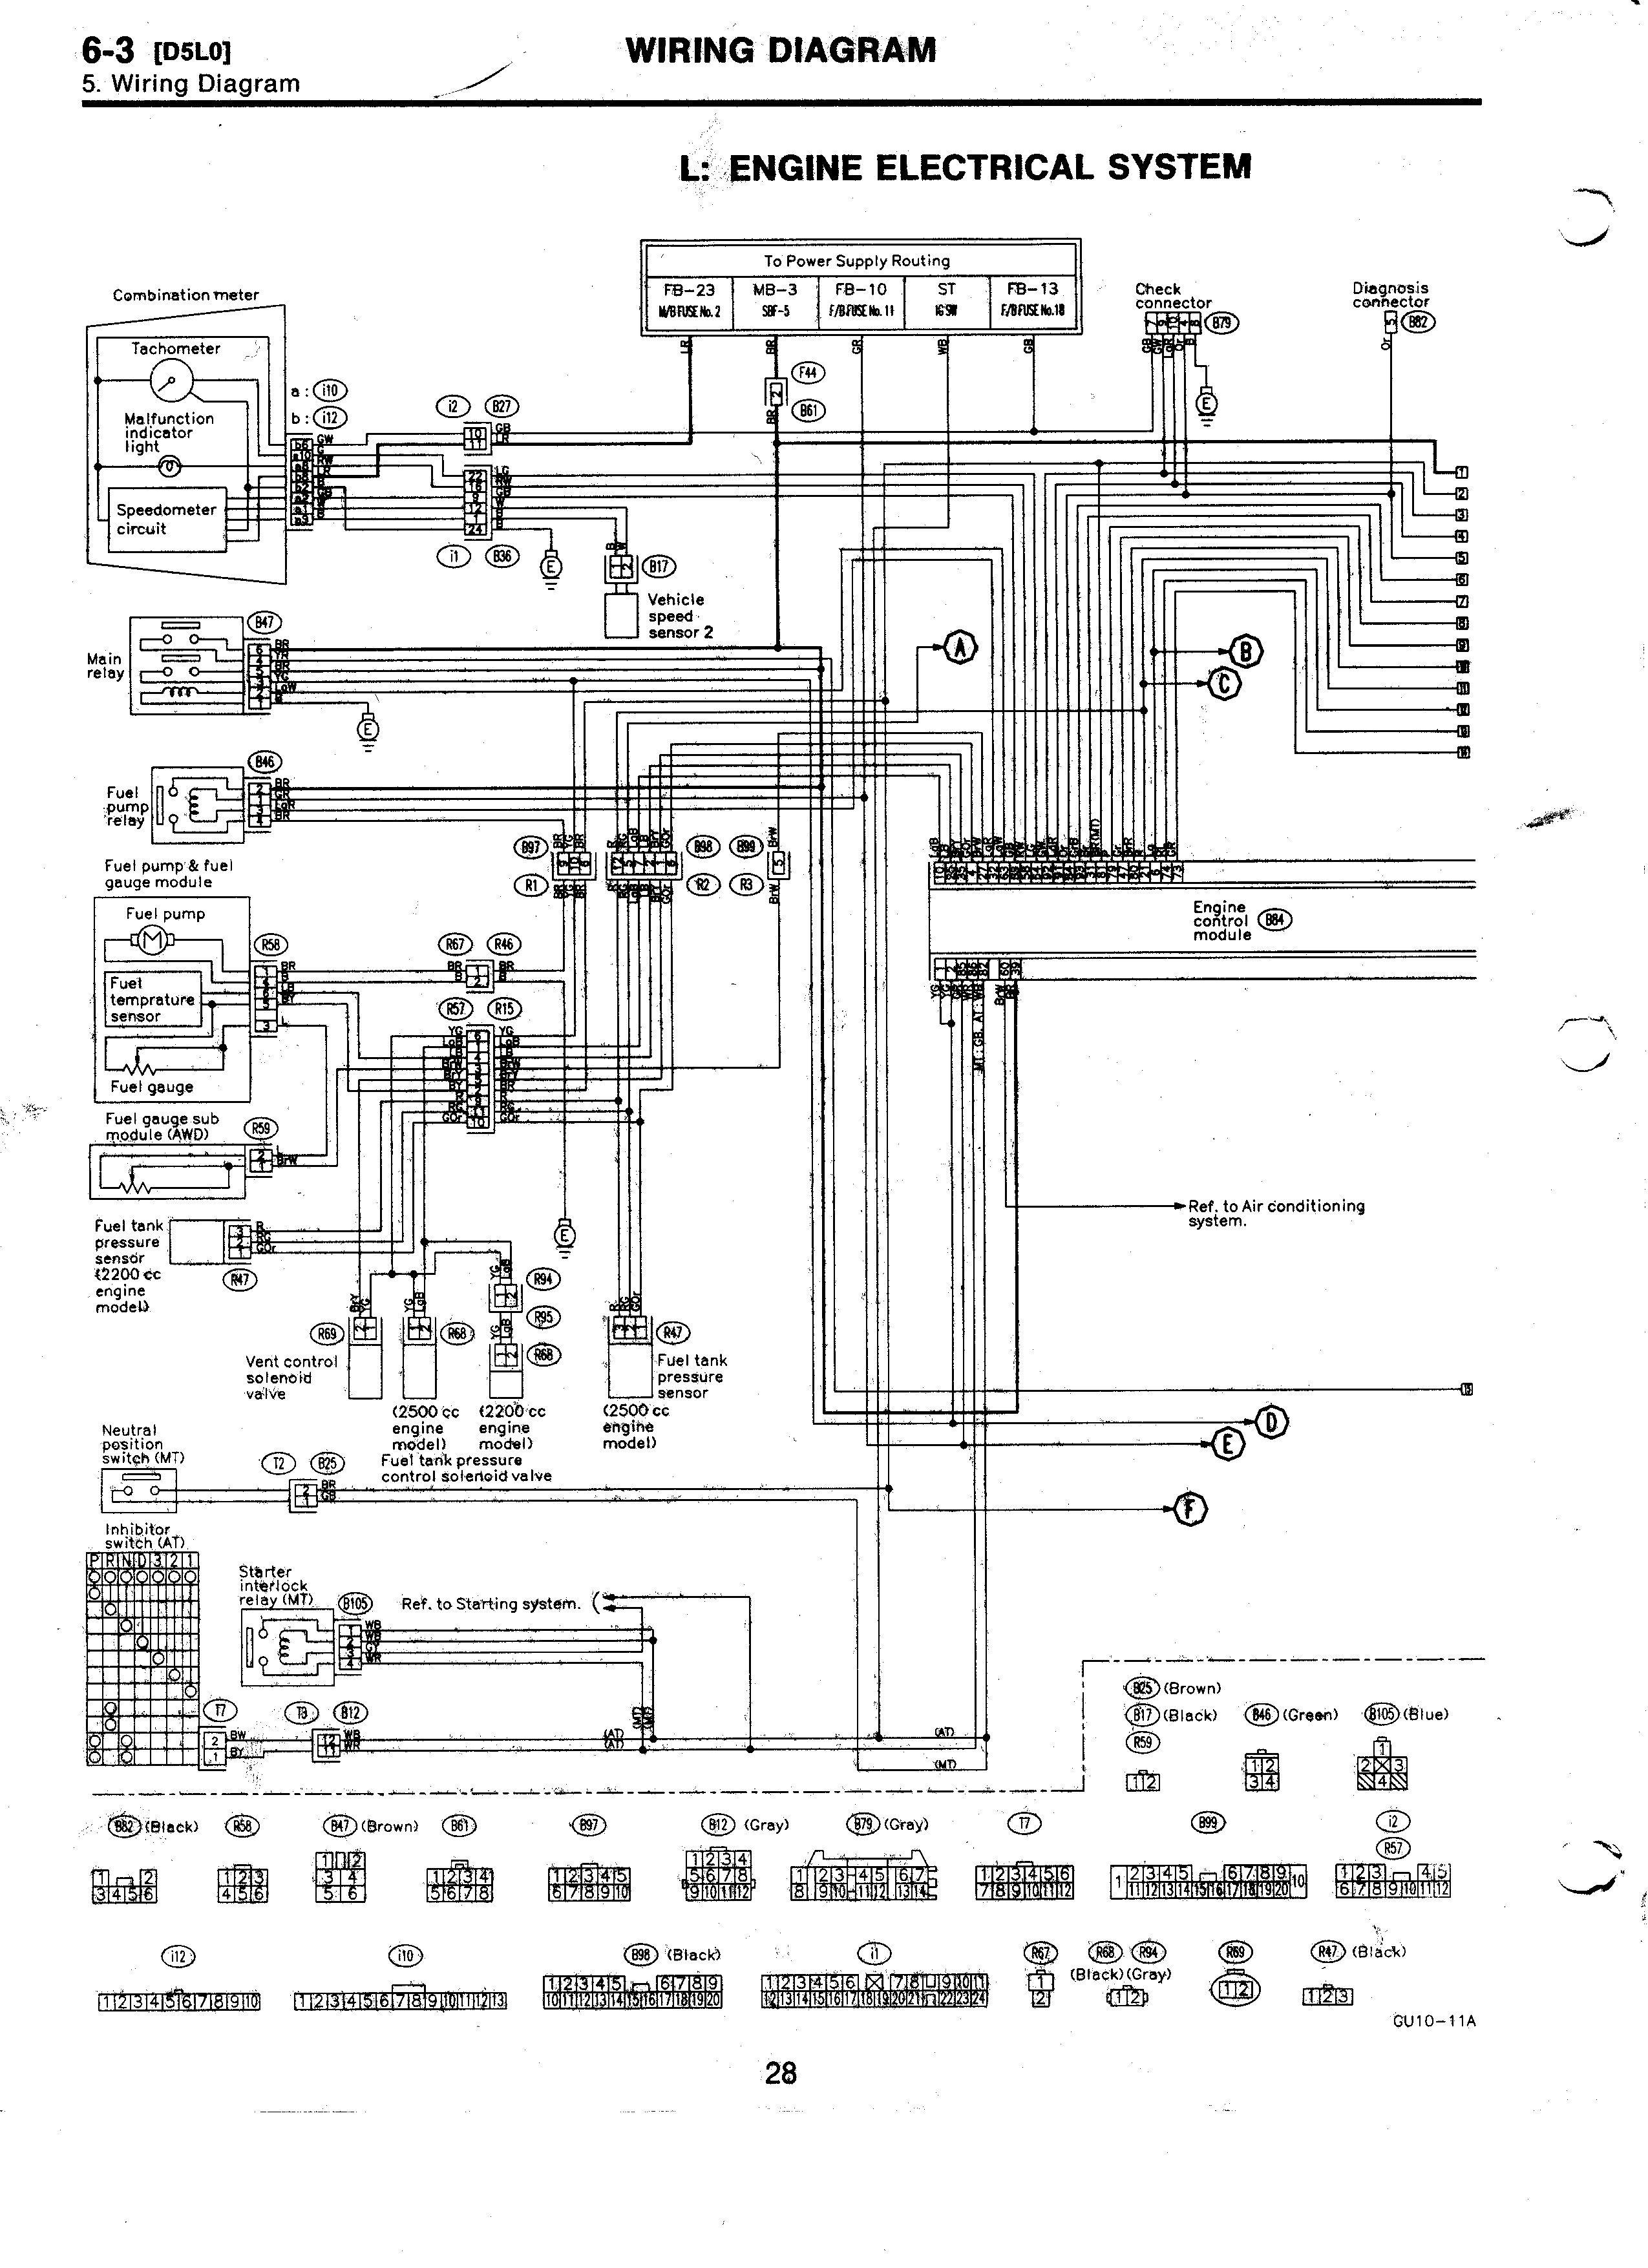 2002 Wrx Engine Diagram In 2021 Subaru Forester Subaru Wrx Engine Subaru